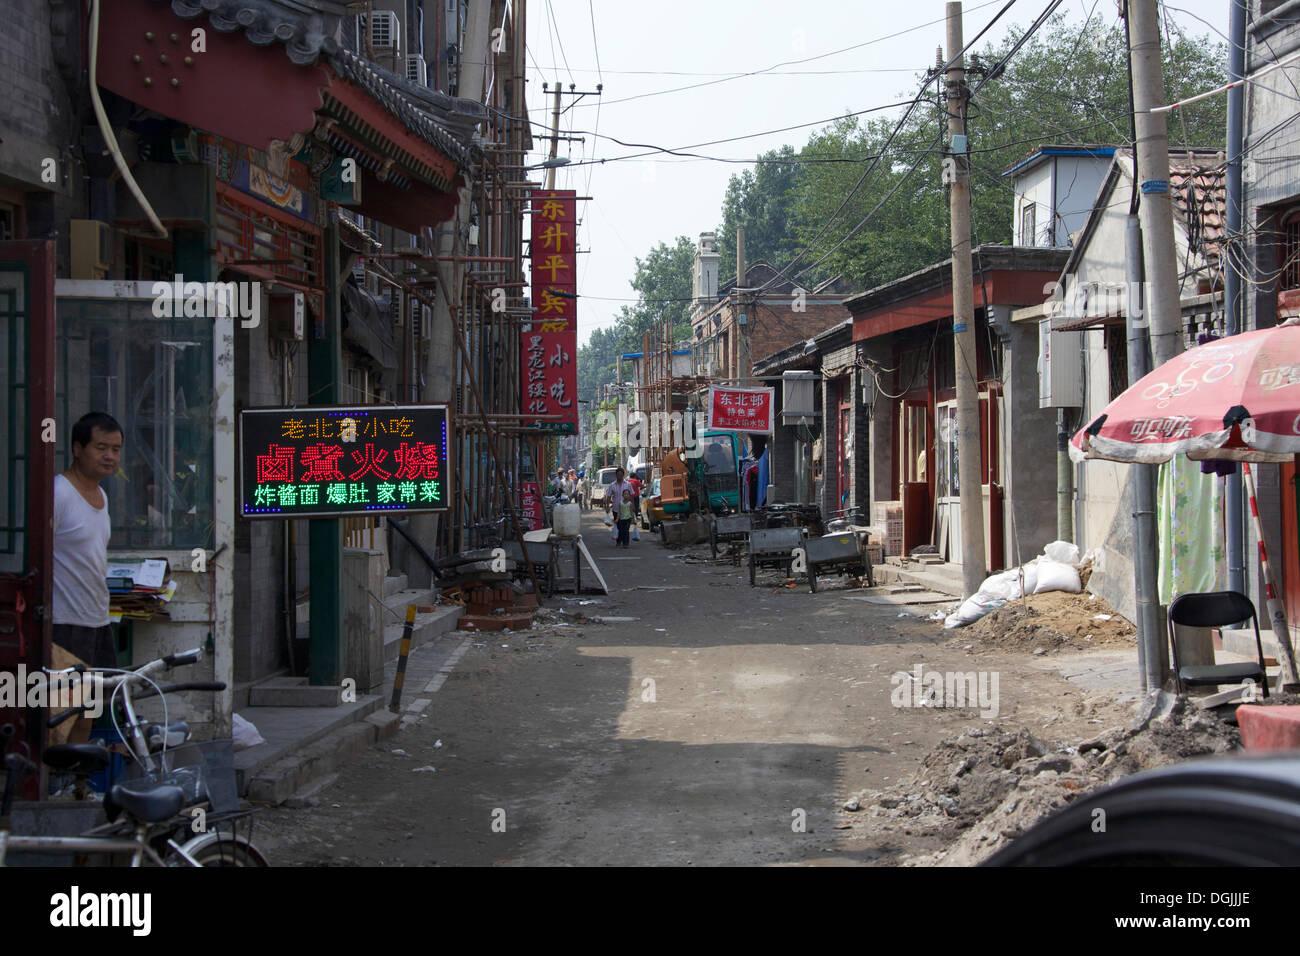 Side street, Beijing, China, People's Republic of China - Stock Image